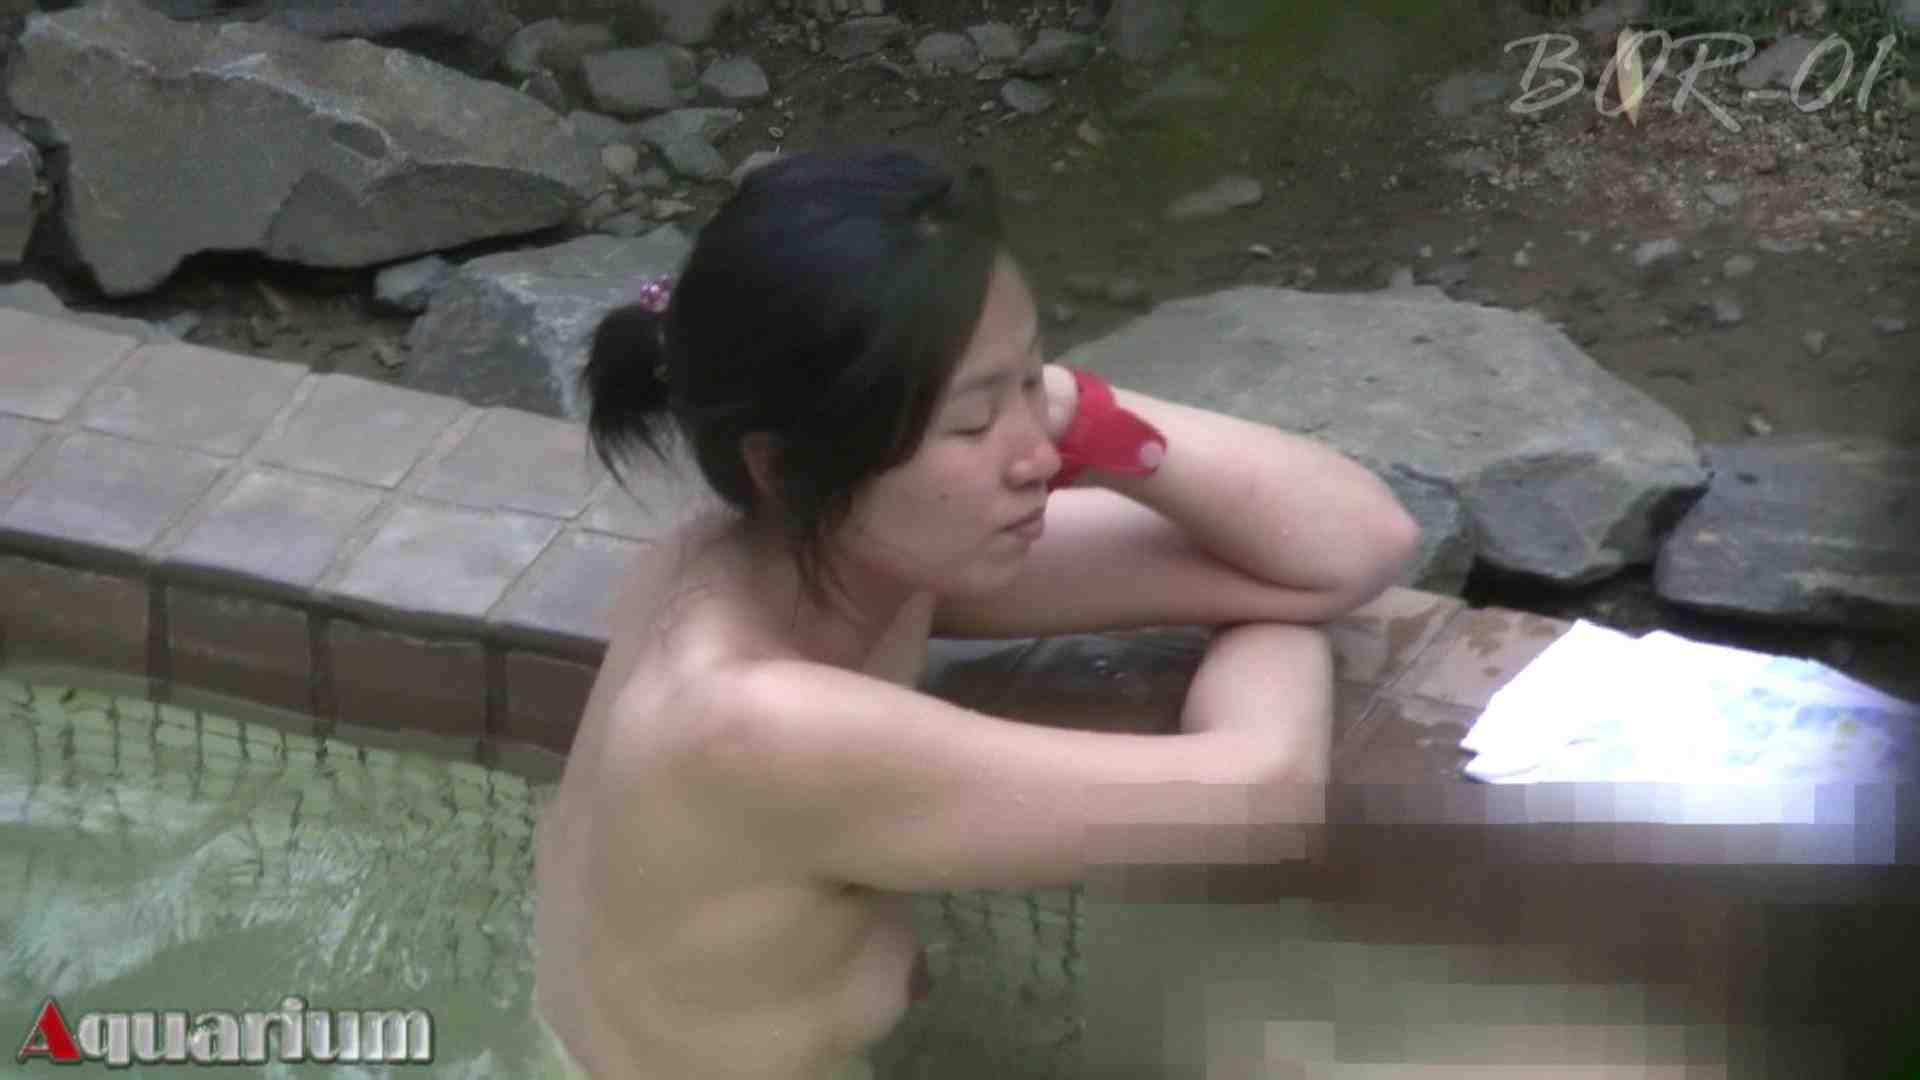 Aquaな露天風呂Vol.465 盗撮 盗み撮り動画キャプチャ 51画像 8